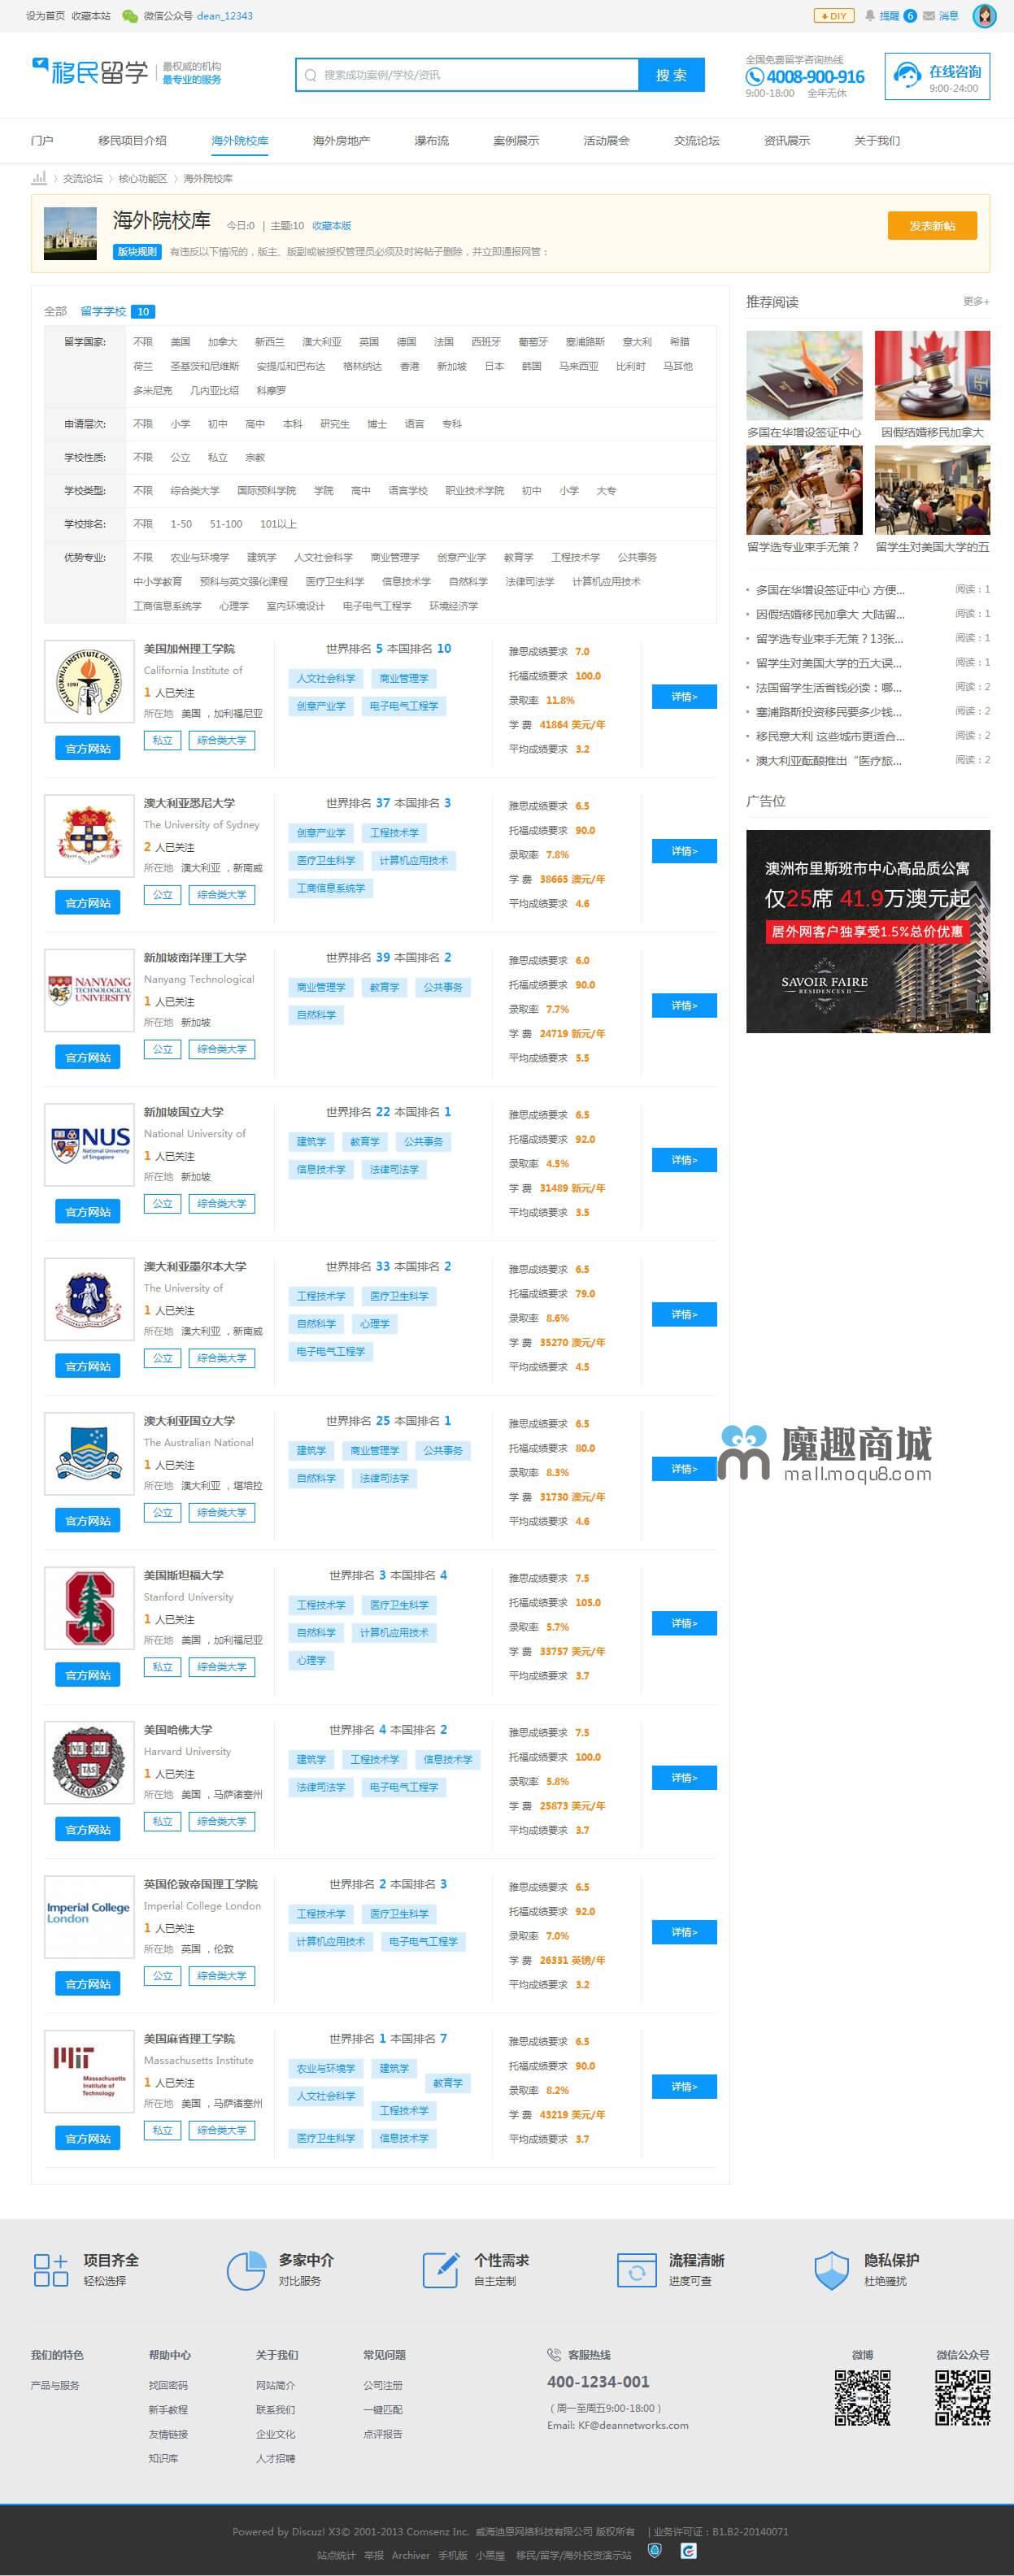 <font color='#44BB44'>留学机构跨国教育中介企业</font>